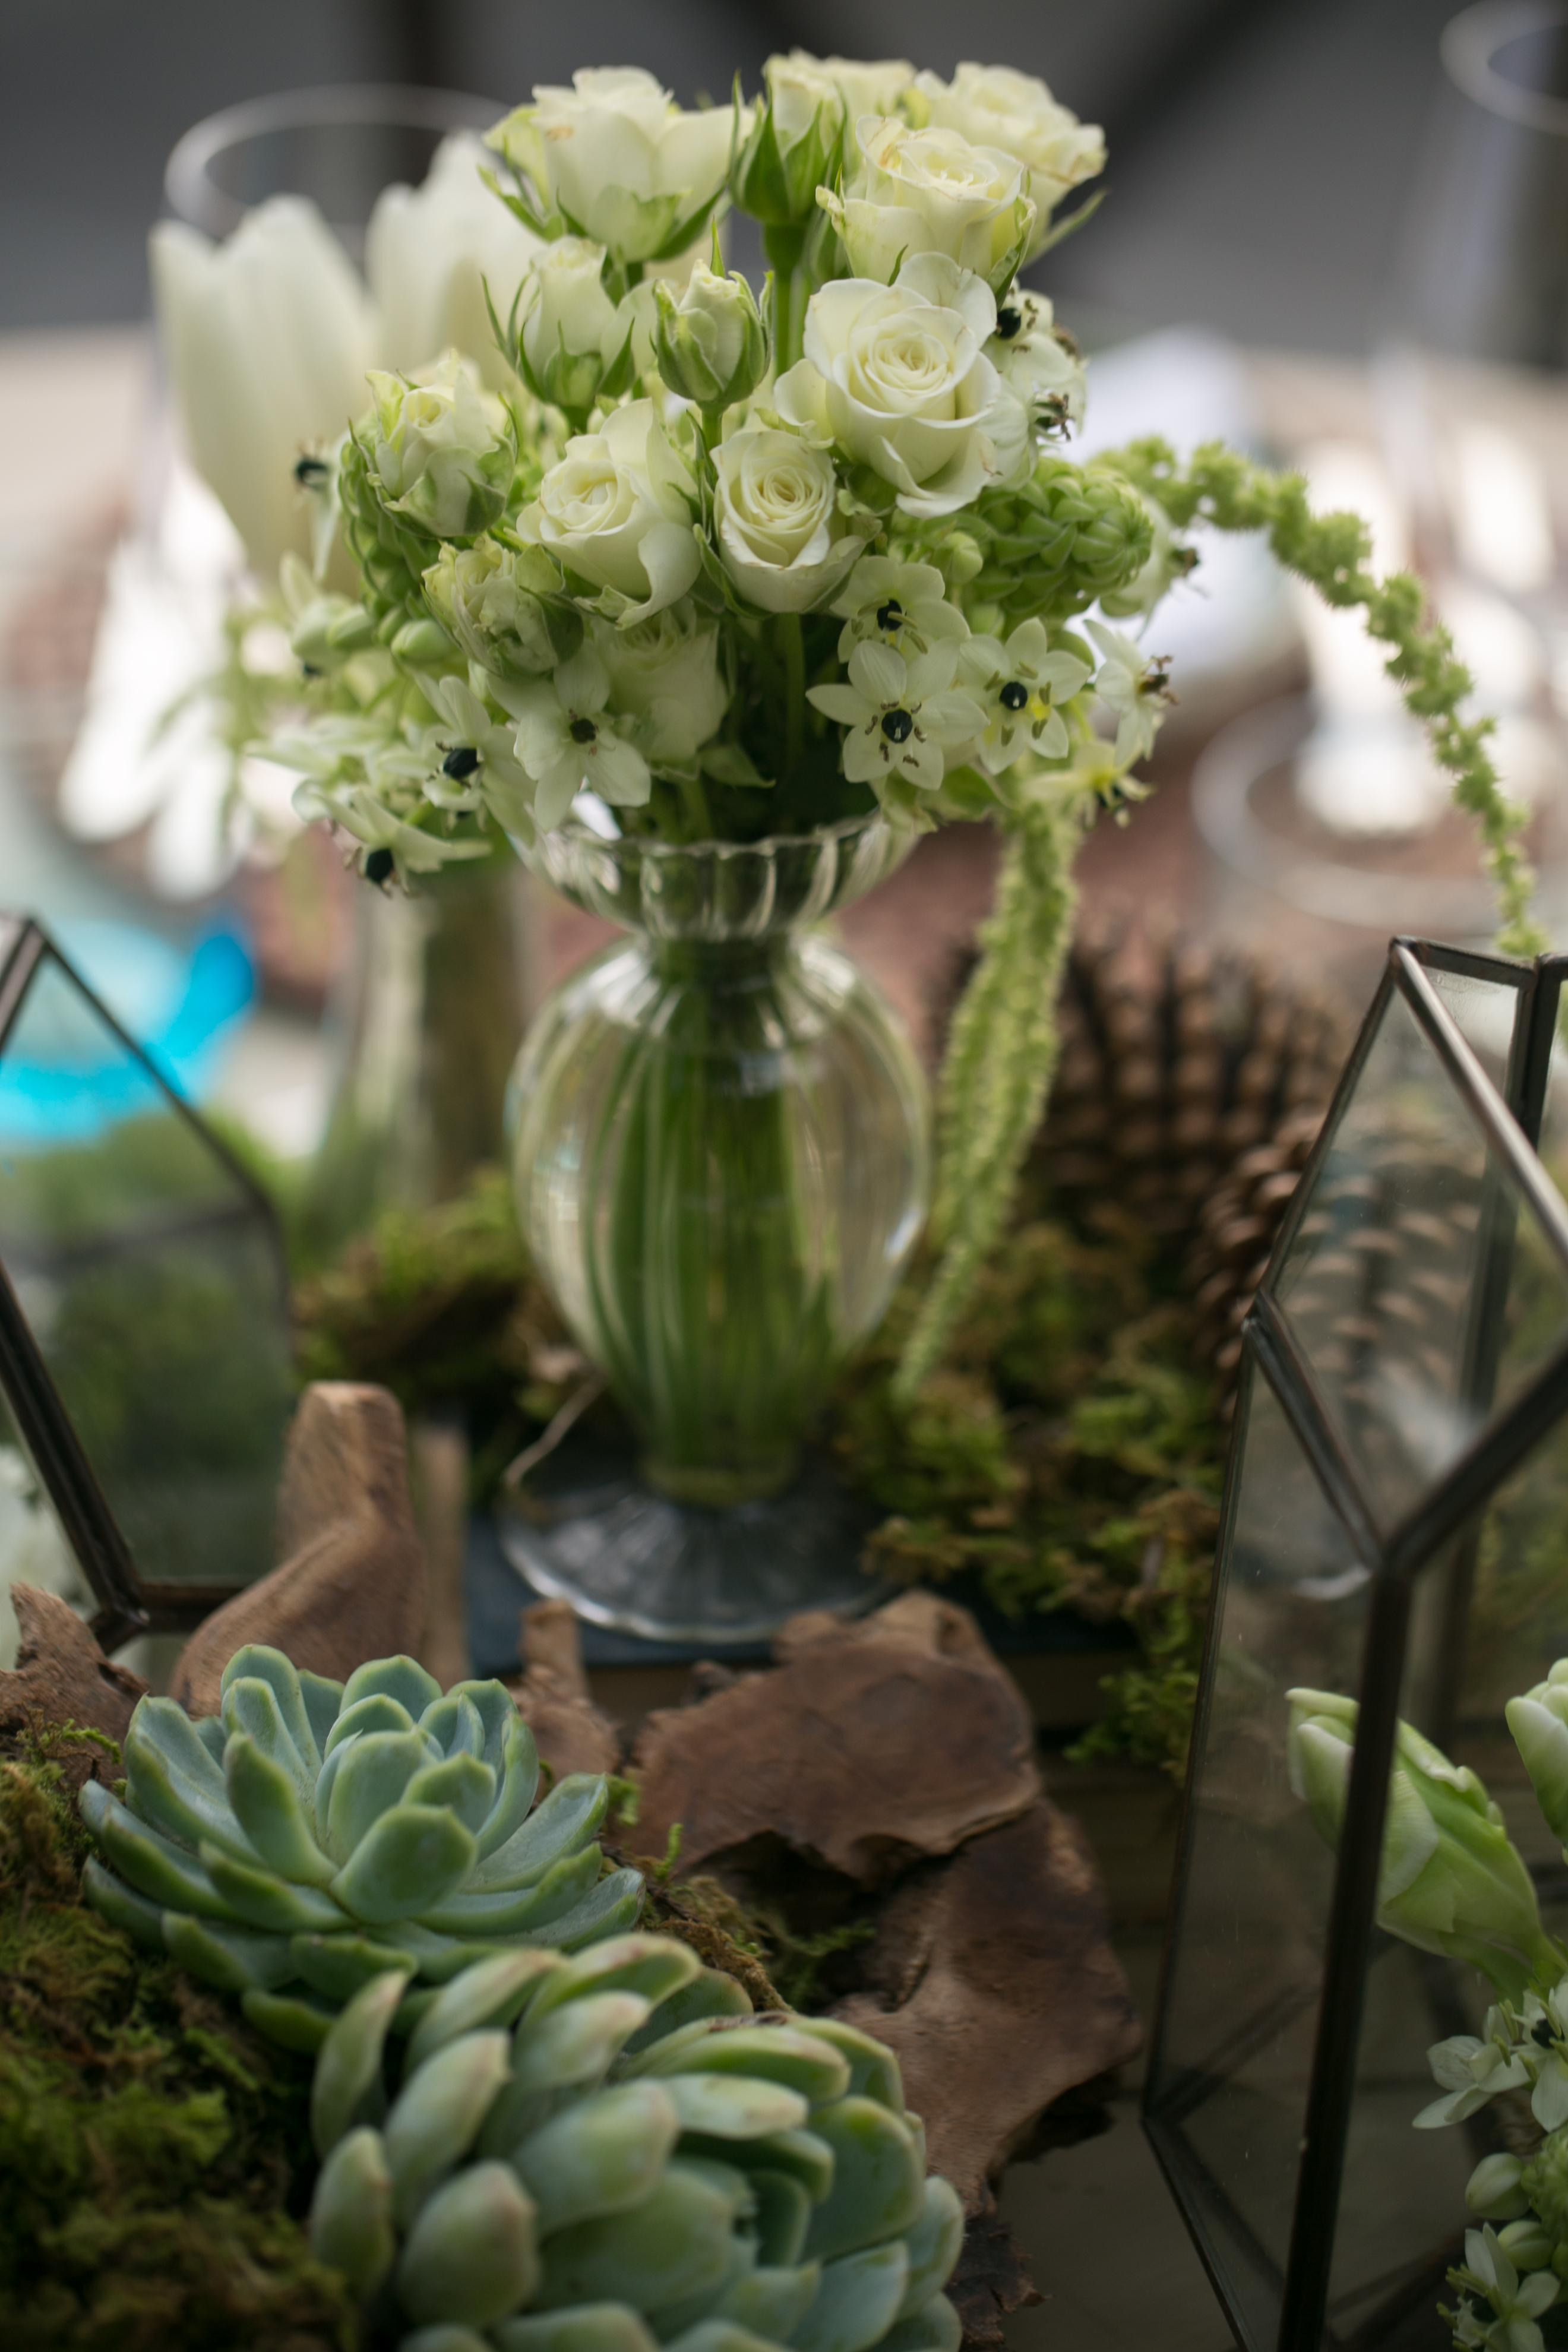 Riviera Maya Getaway: Intimate Garden Dinner - Elegant Occasions by JoAnn Gregoli